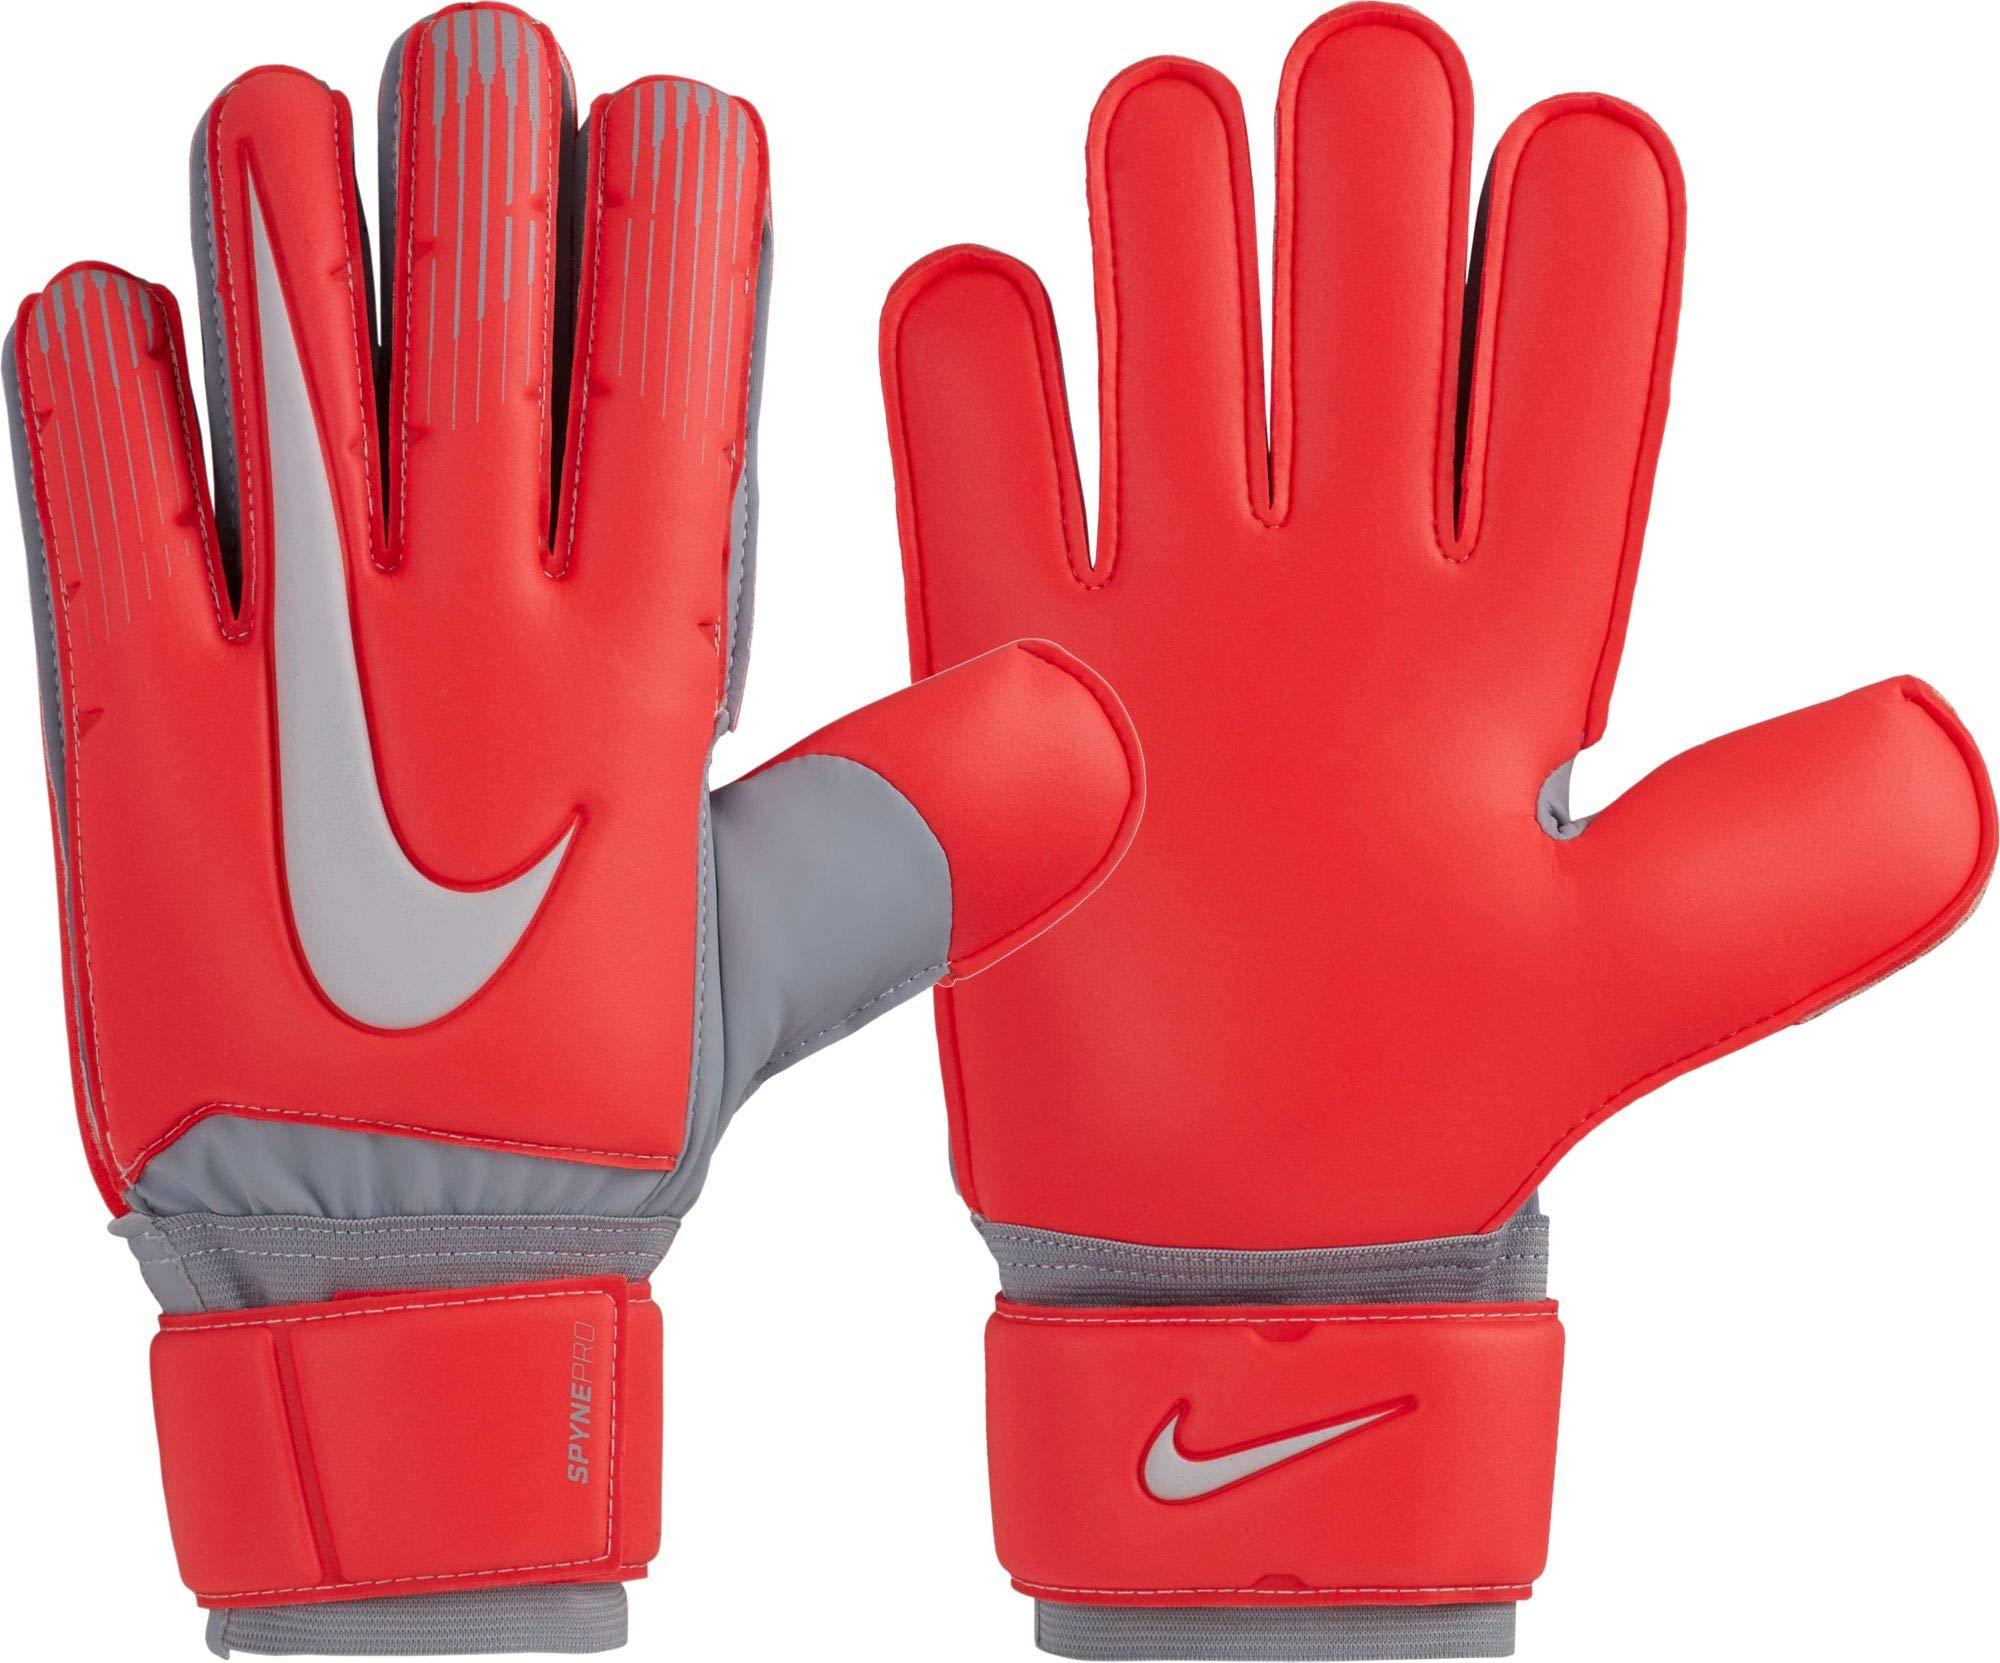 Nike Adult Spyne Pro Soccer Goalkeeper Gloves (Red/Grey, 7)